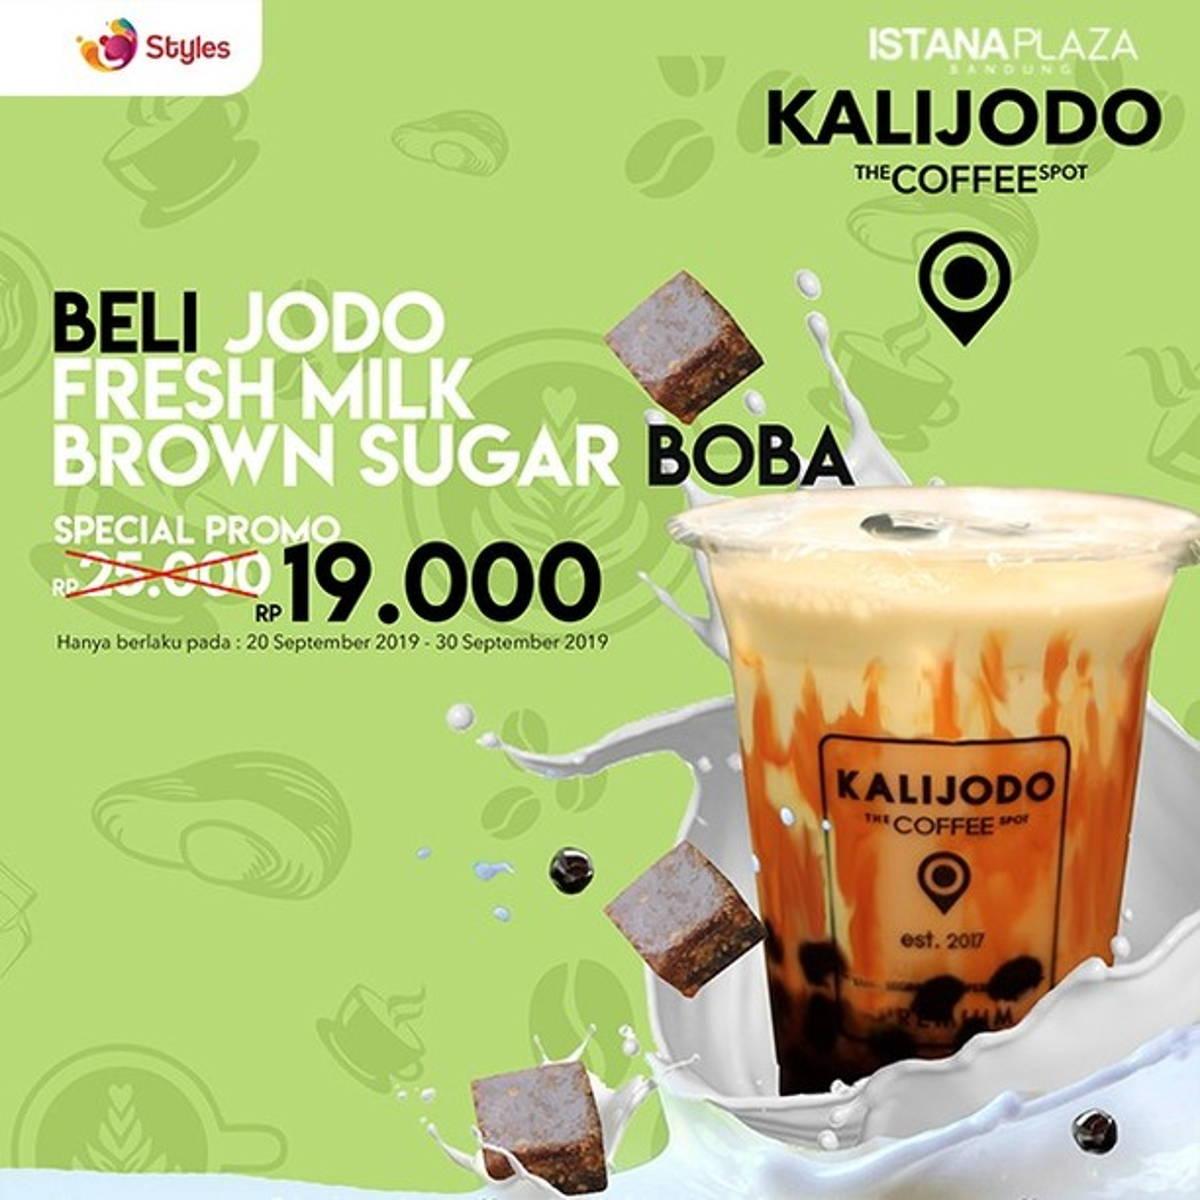 Katalog Promo: KALIJODO Coffee: Promo jodo fresh milk brown sugar boba CUMA Rp. 19.000- - 1